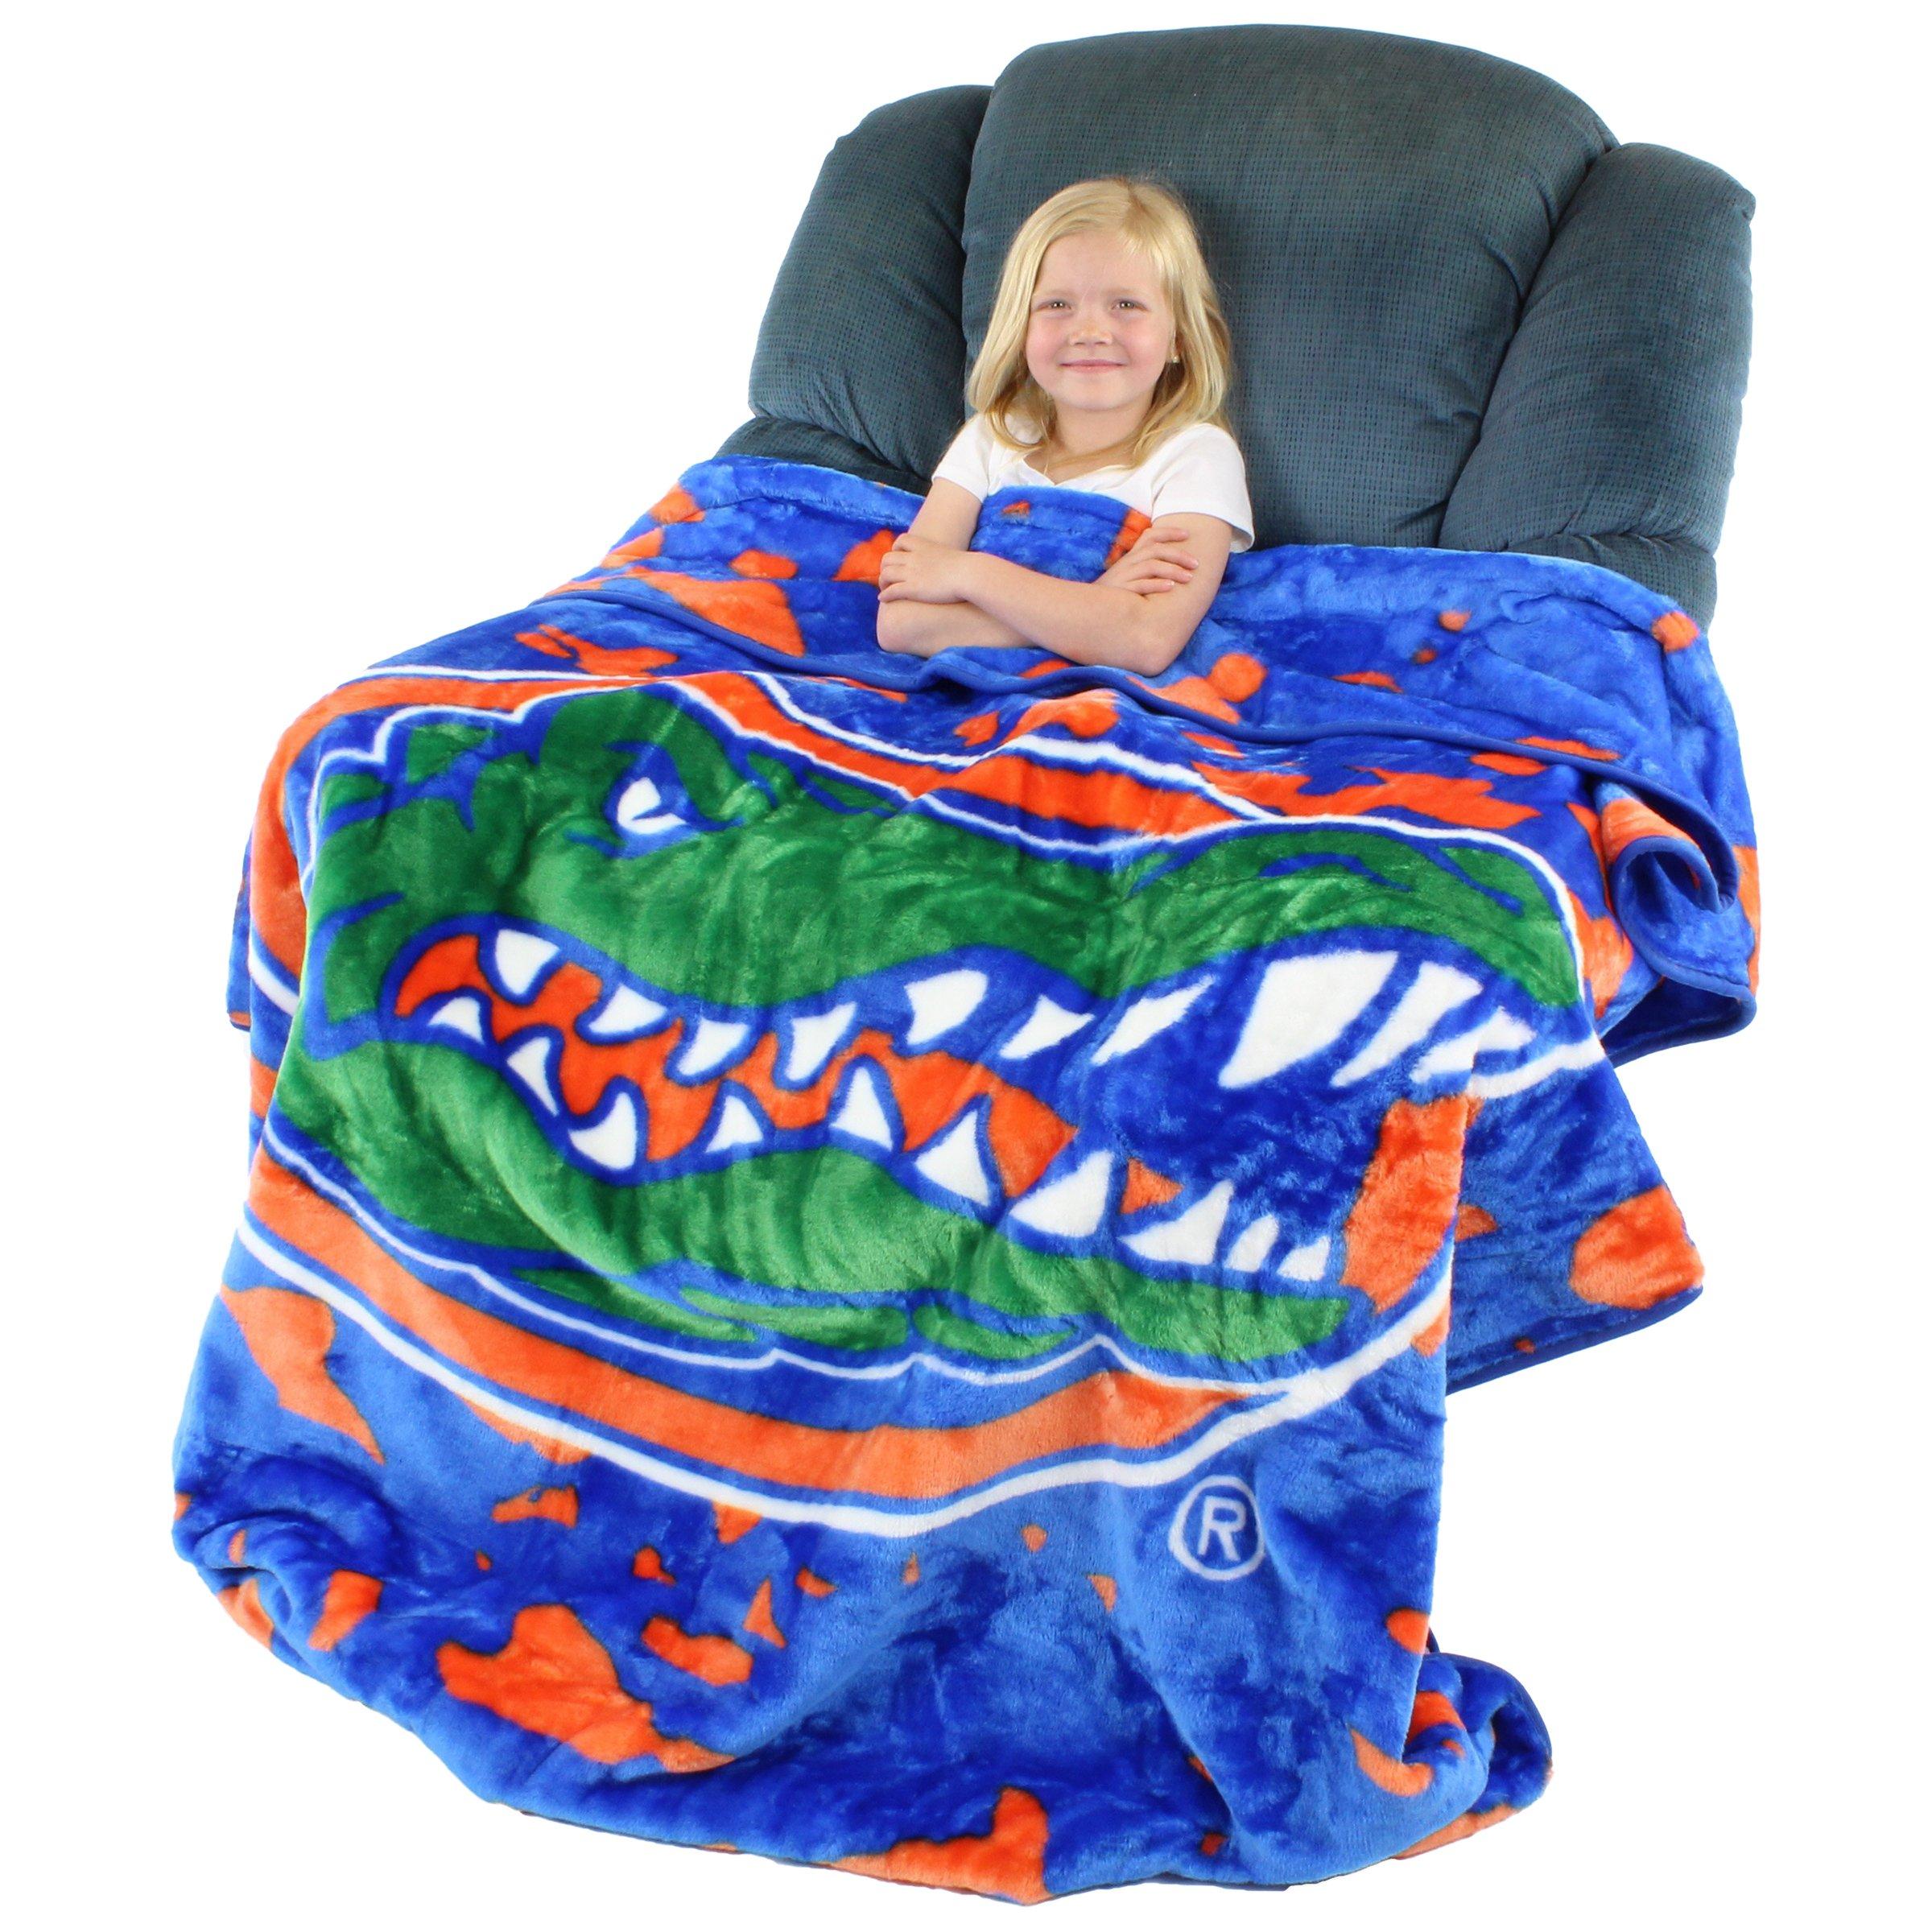 College Covers Florida Gators Throw Blanket/Bedspread